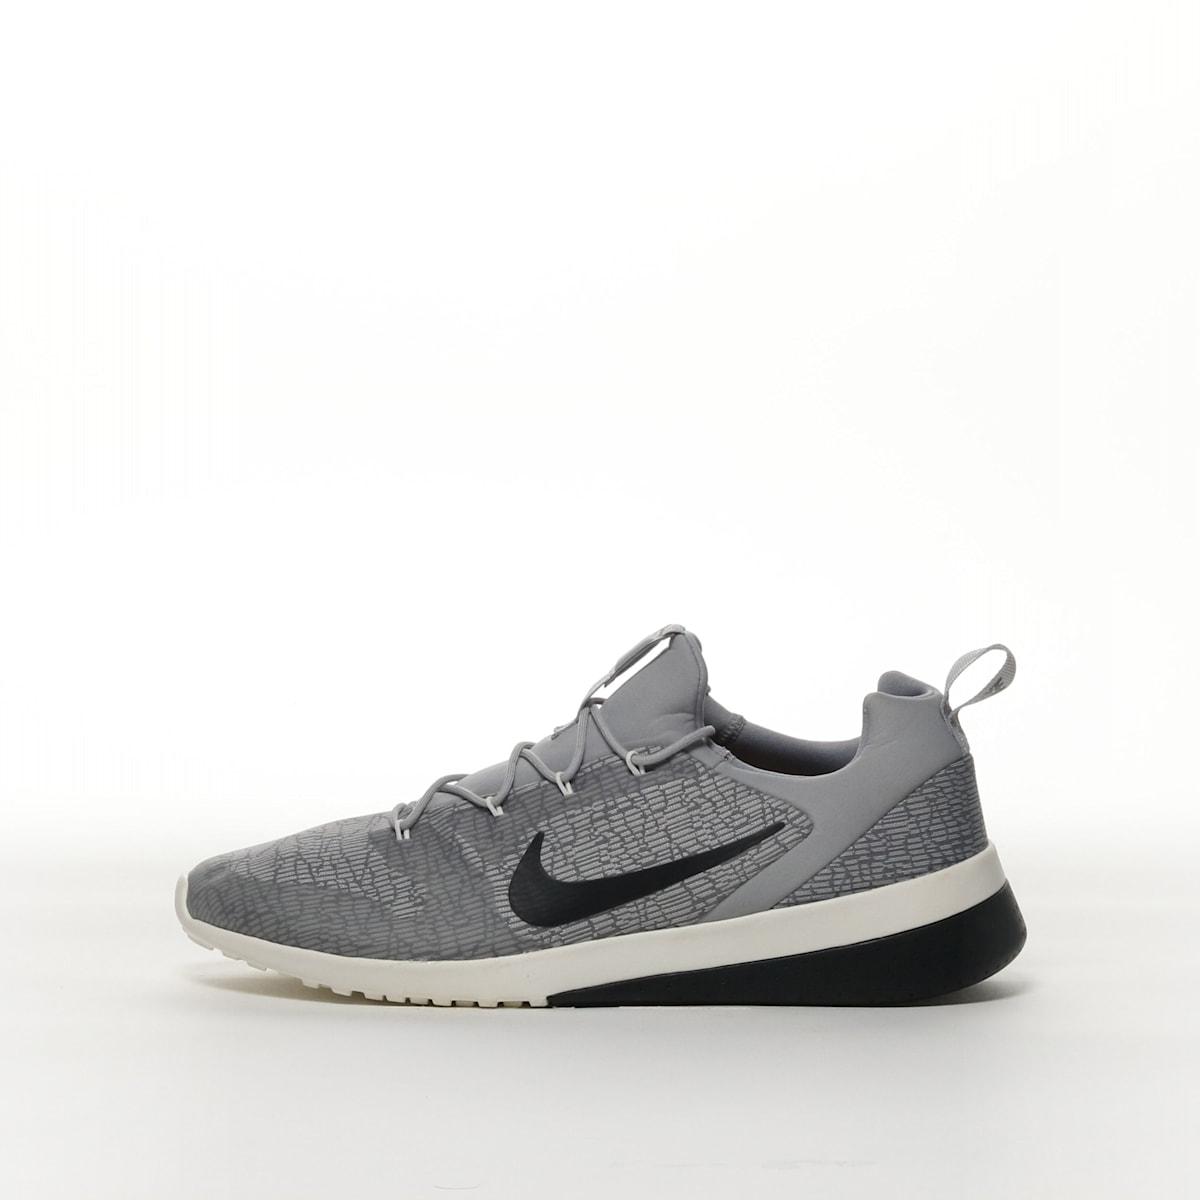 quality design 71747 8e260 Men s Nike CK Racer Shoe - COOL GREY BLACK-WOLF GREY-SAIL – Resku